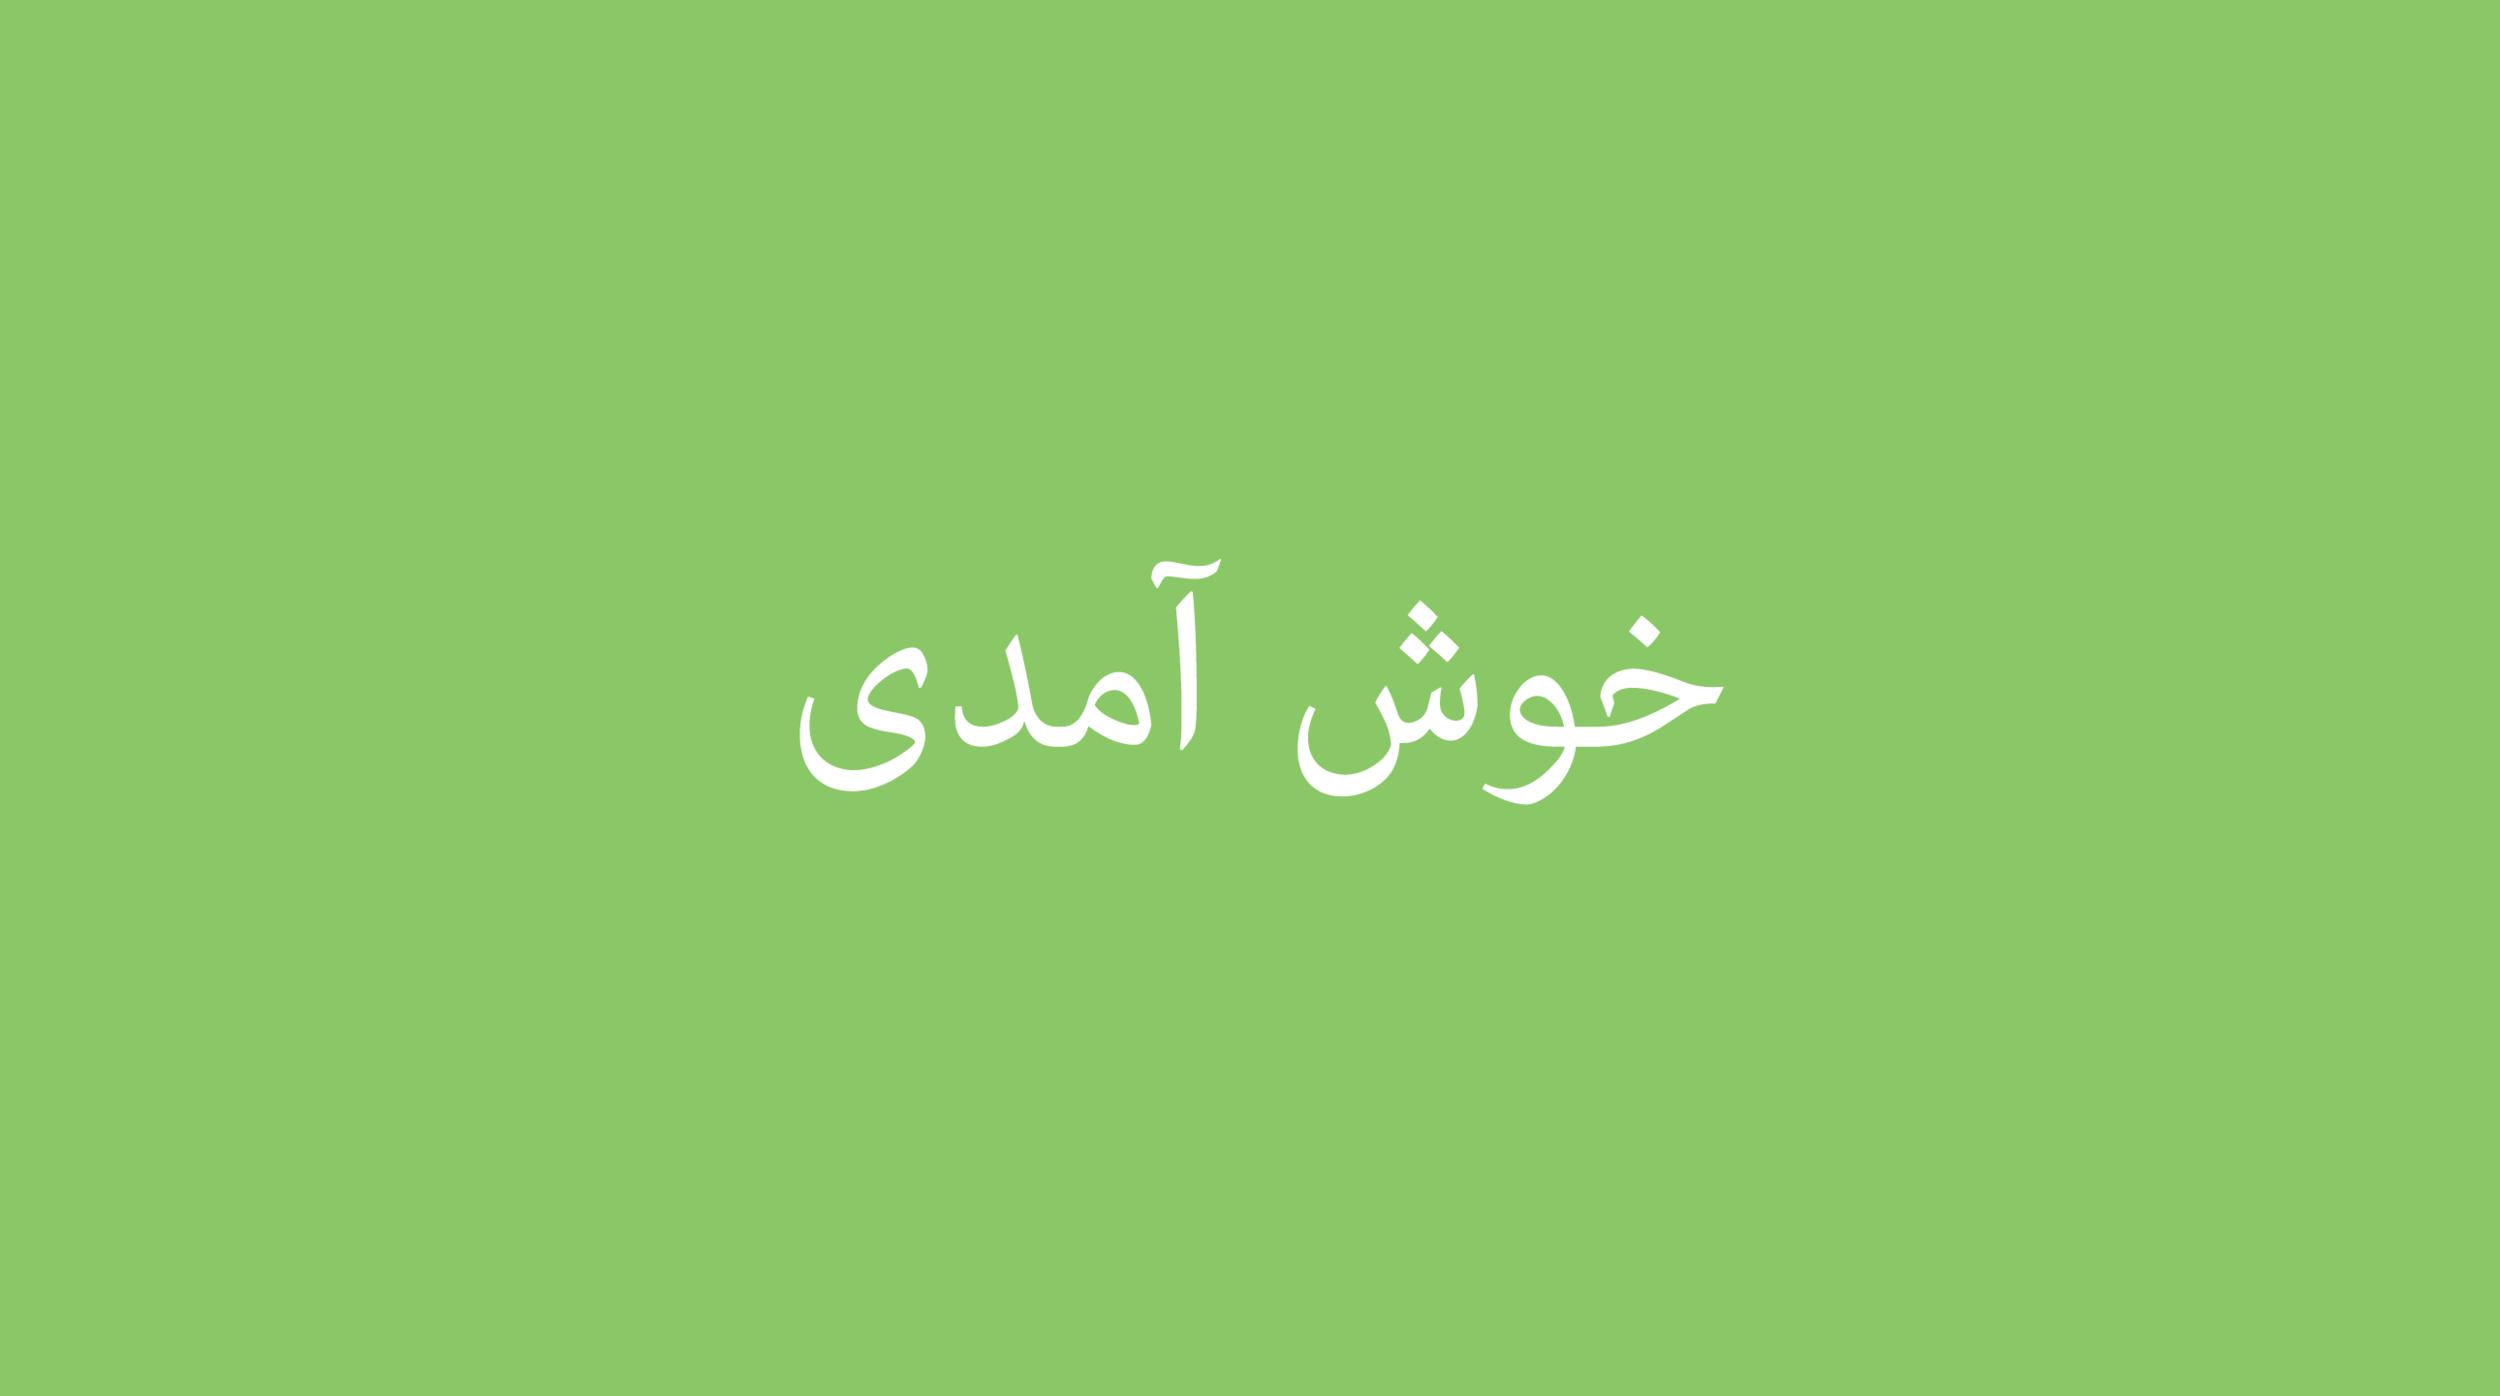 3_WelcomeBanner_Farsi_Correct.png